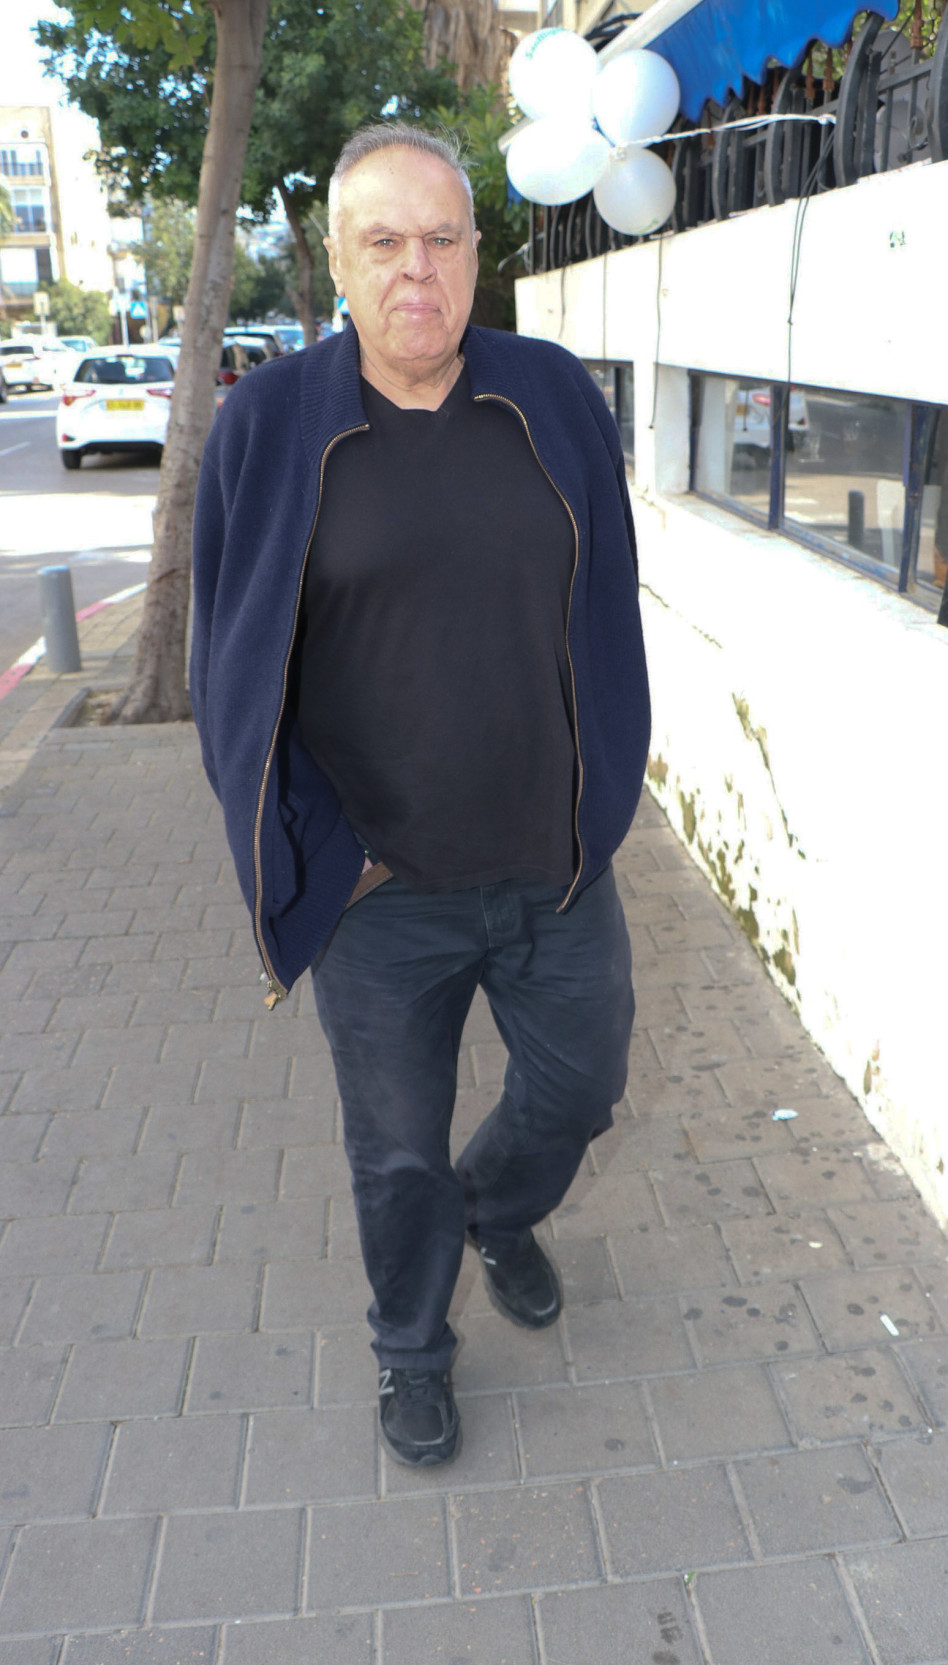 רוני דניאל (צילום: ניר פקין)